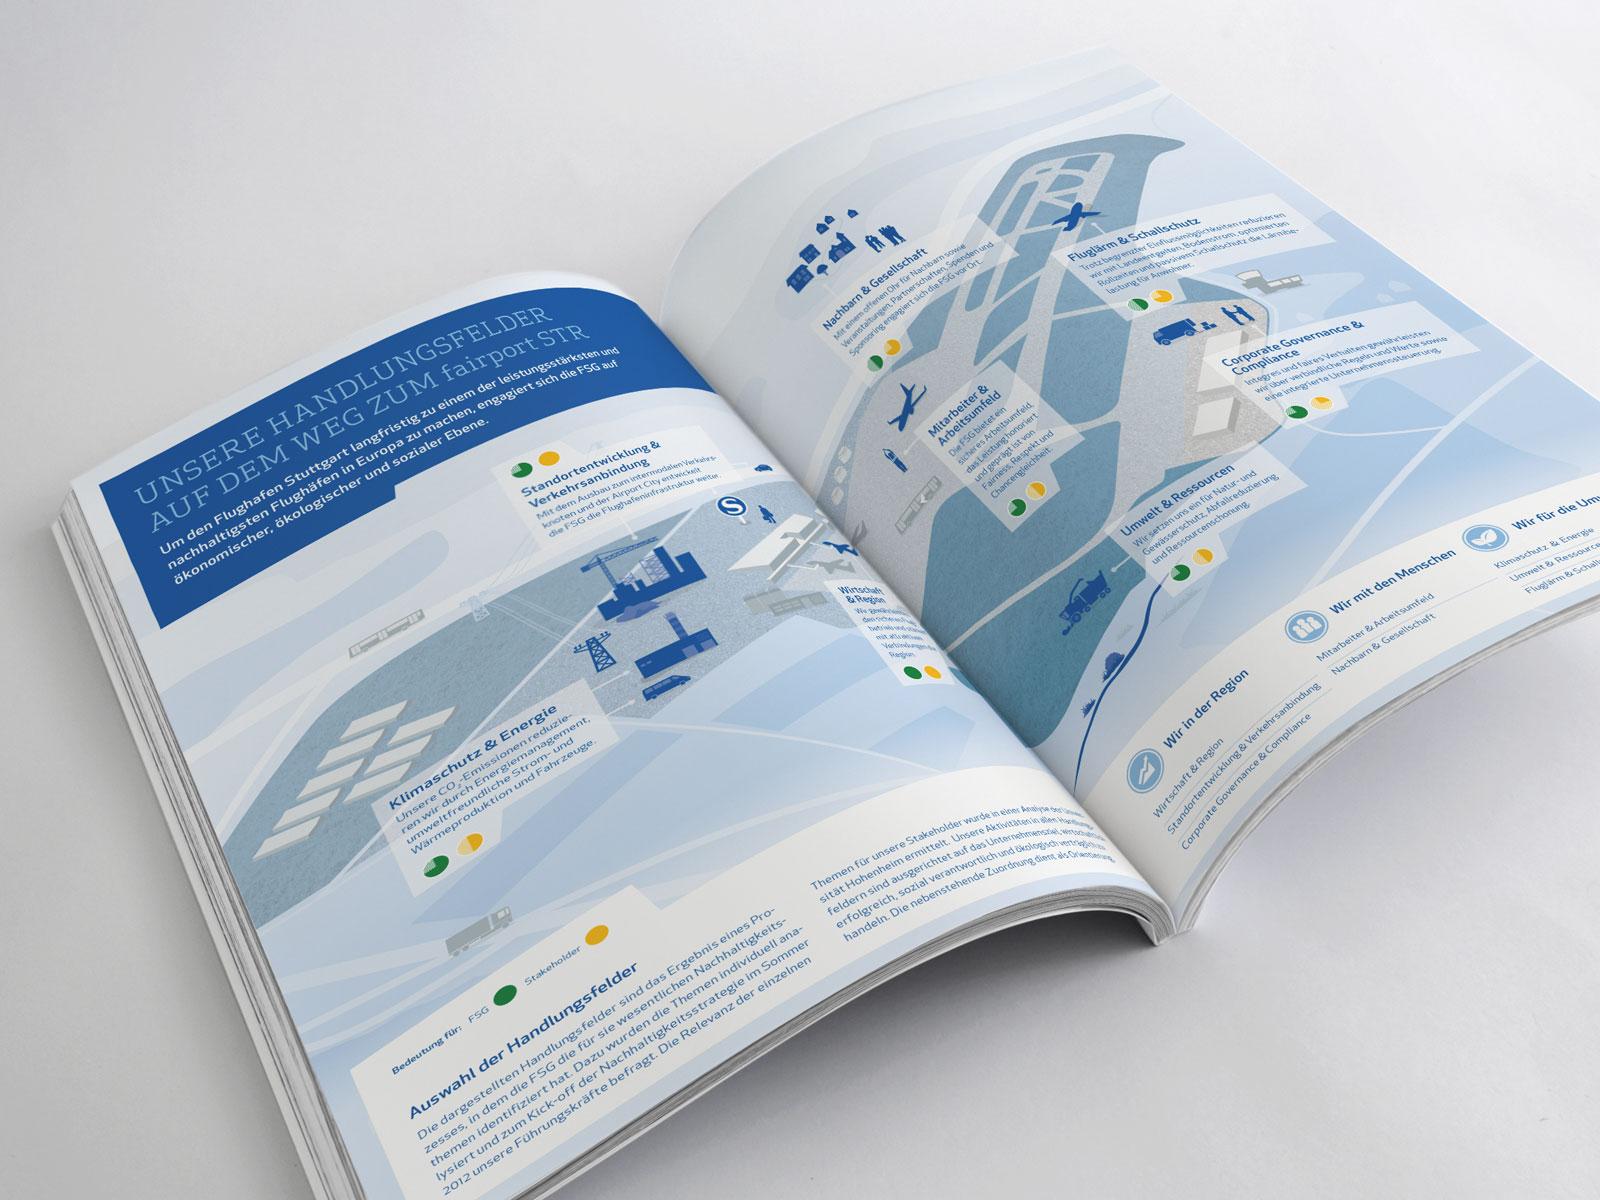 portfiolio_kromativ_fsg_corporate_publishing_infografik_03